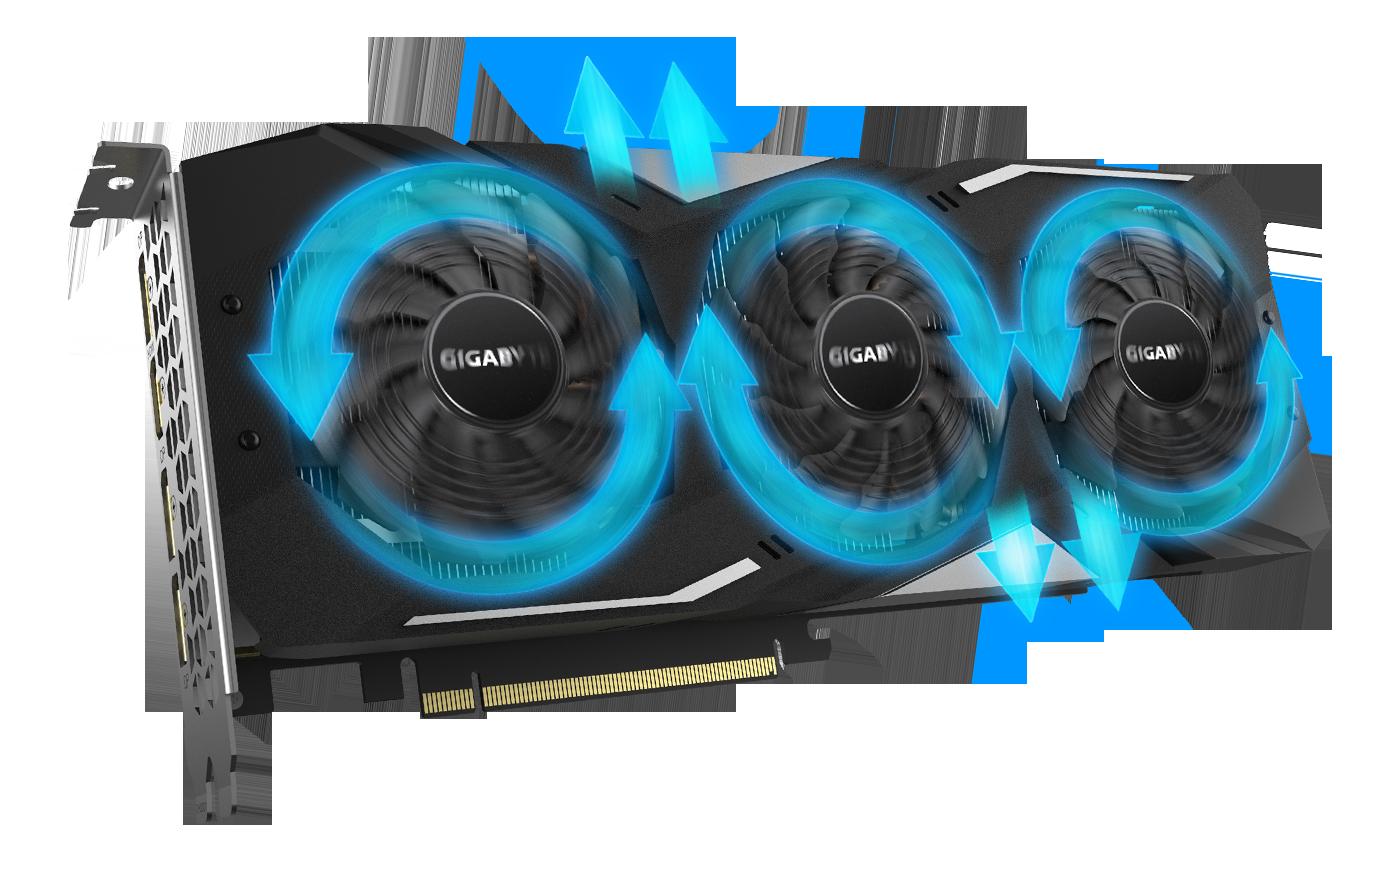 GeForce® GTX 1660 SUPER™ GAMING OC 6G with the aluminum radiator